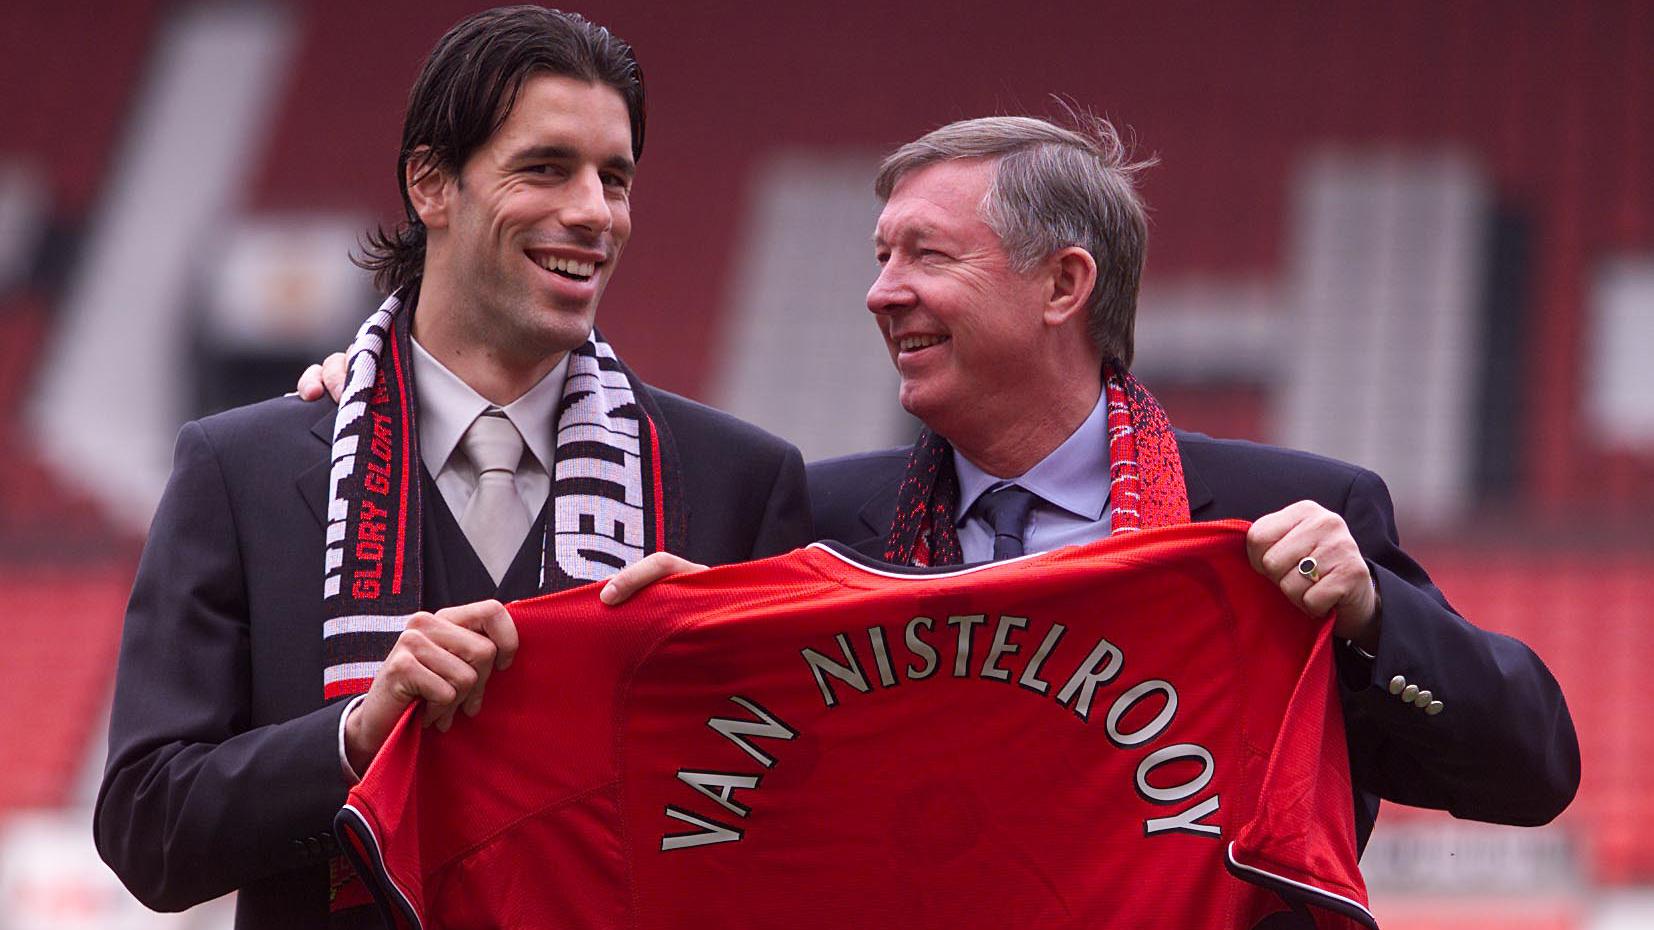 Ruud van Nistelrooy Manchester United 2001